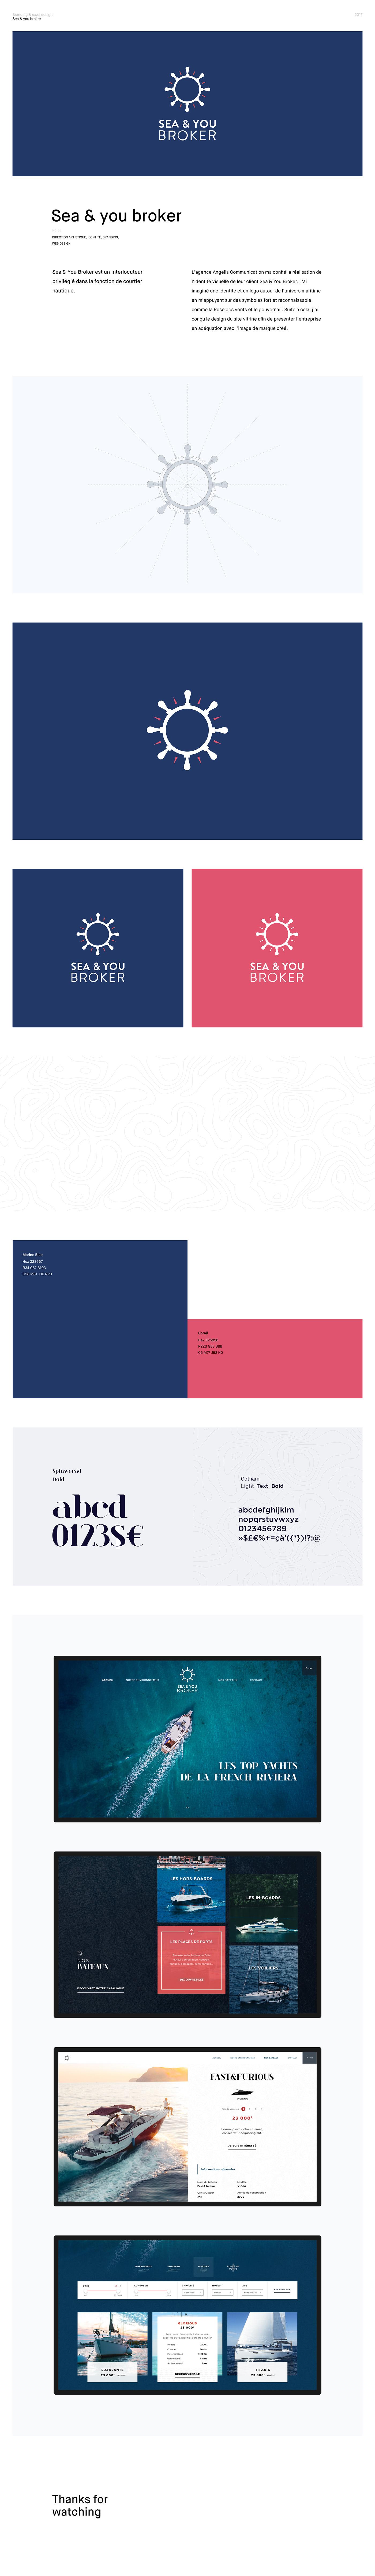 boat branding  identity logo ui design UX design Webdesign